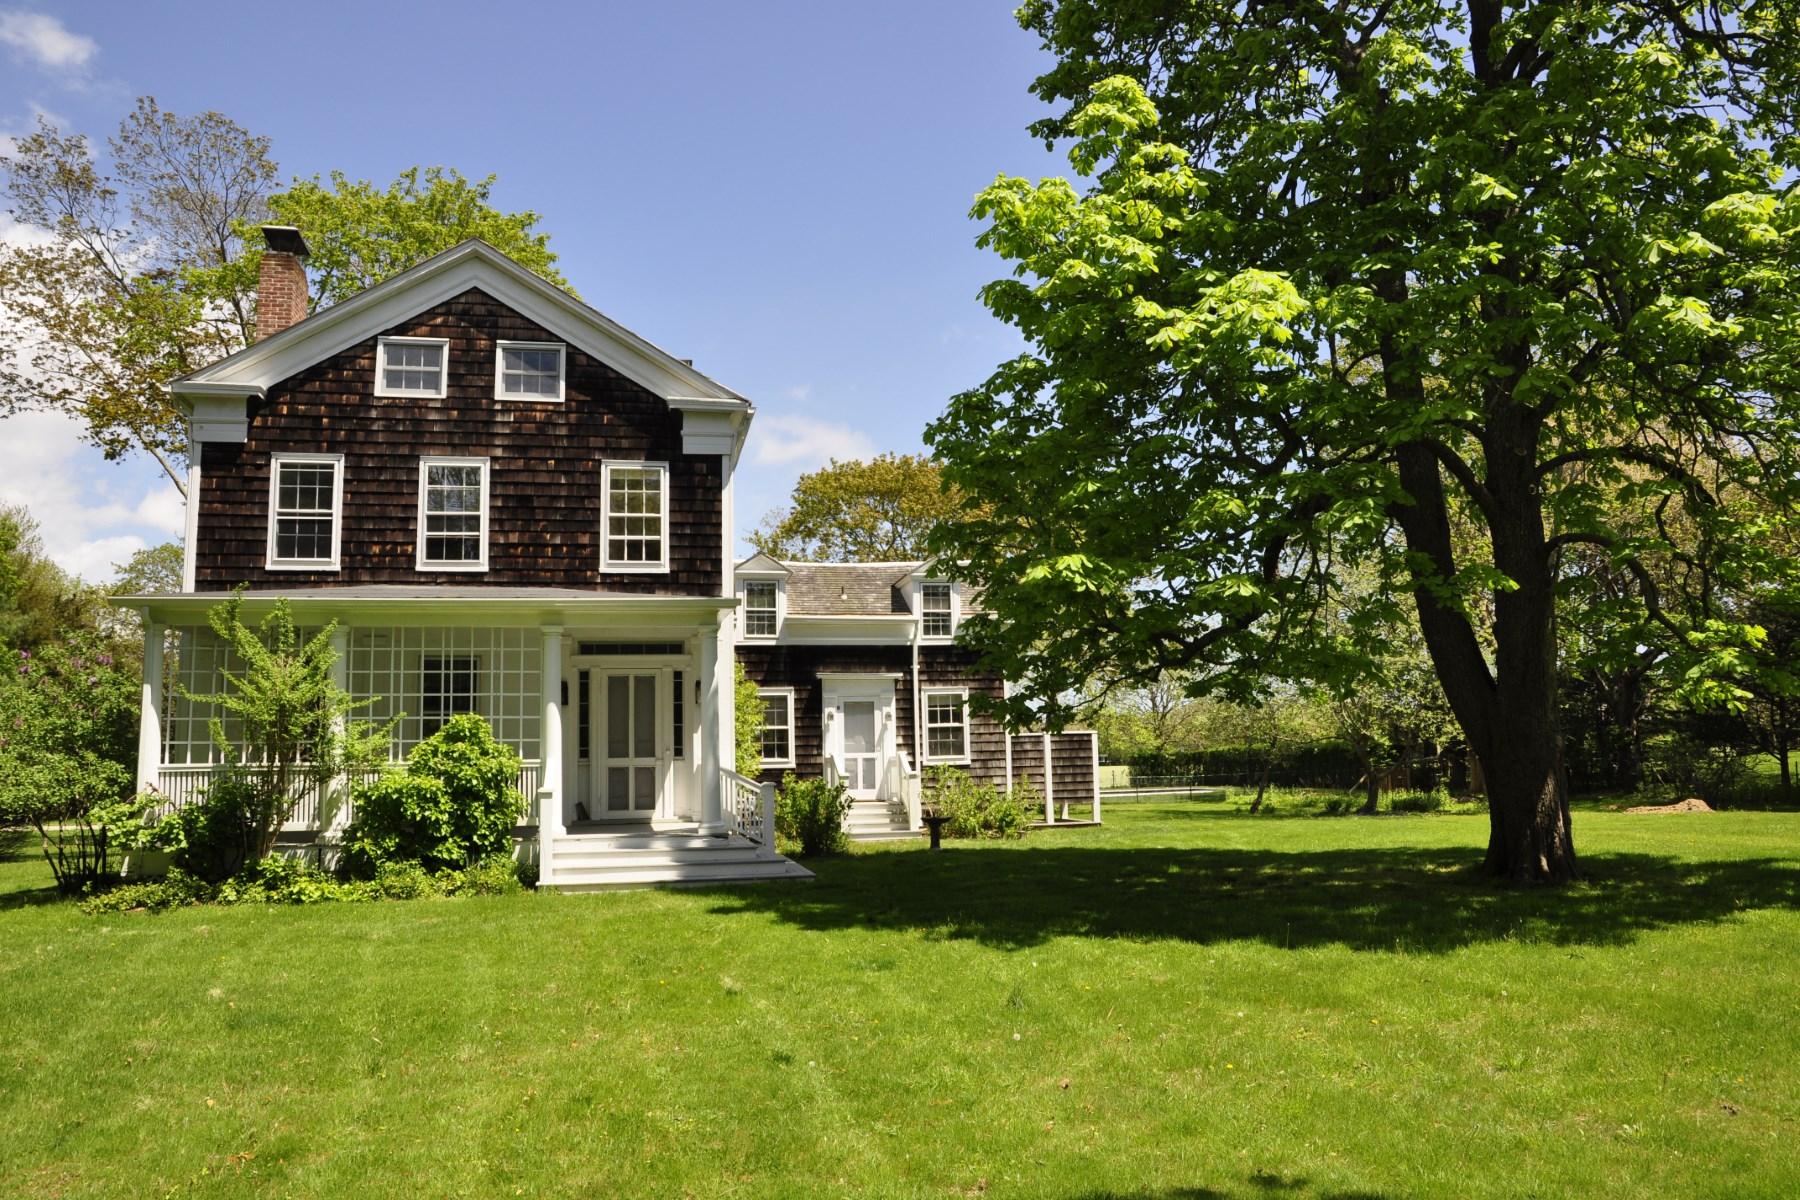 Single Family Home for Rent at Steps from Transportation 131 Butter Lane Bridgehampton, New York 11932 United States